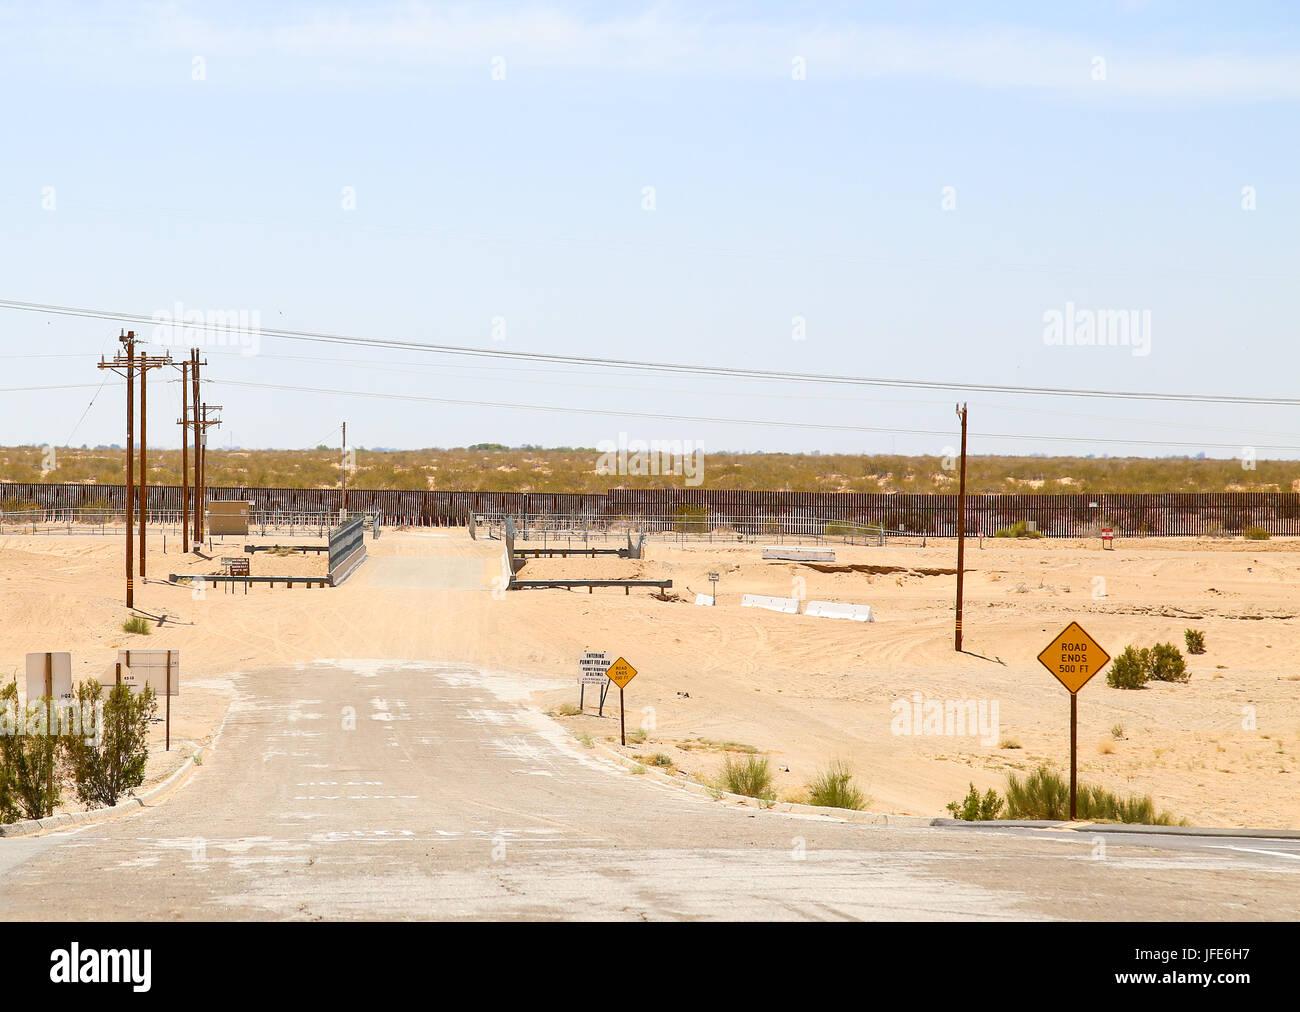 U.S.-Mexico Border Fence - Stock Image